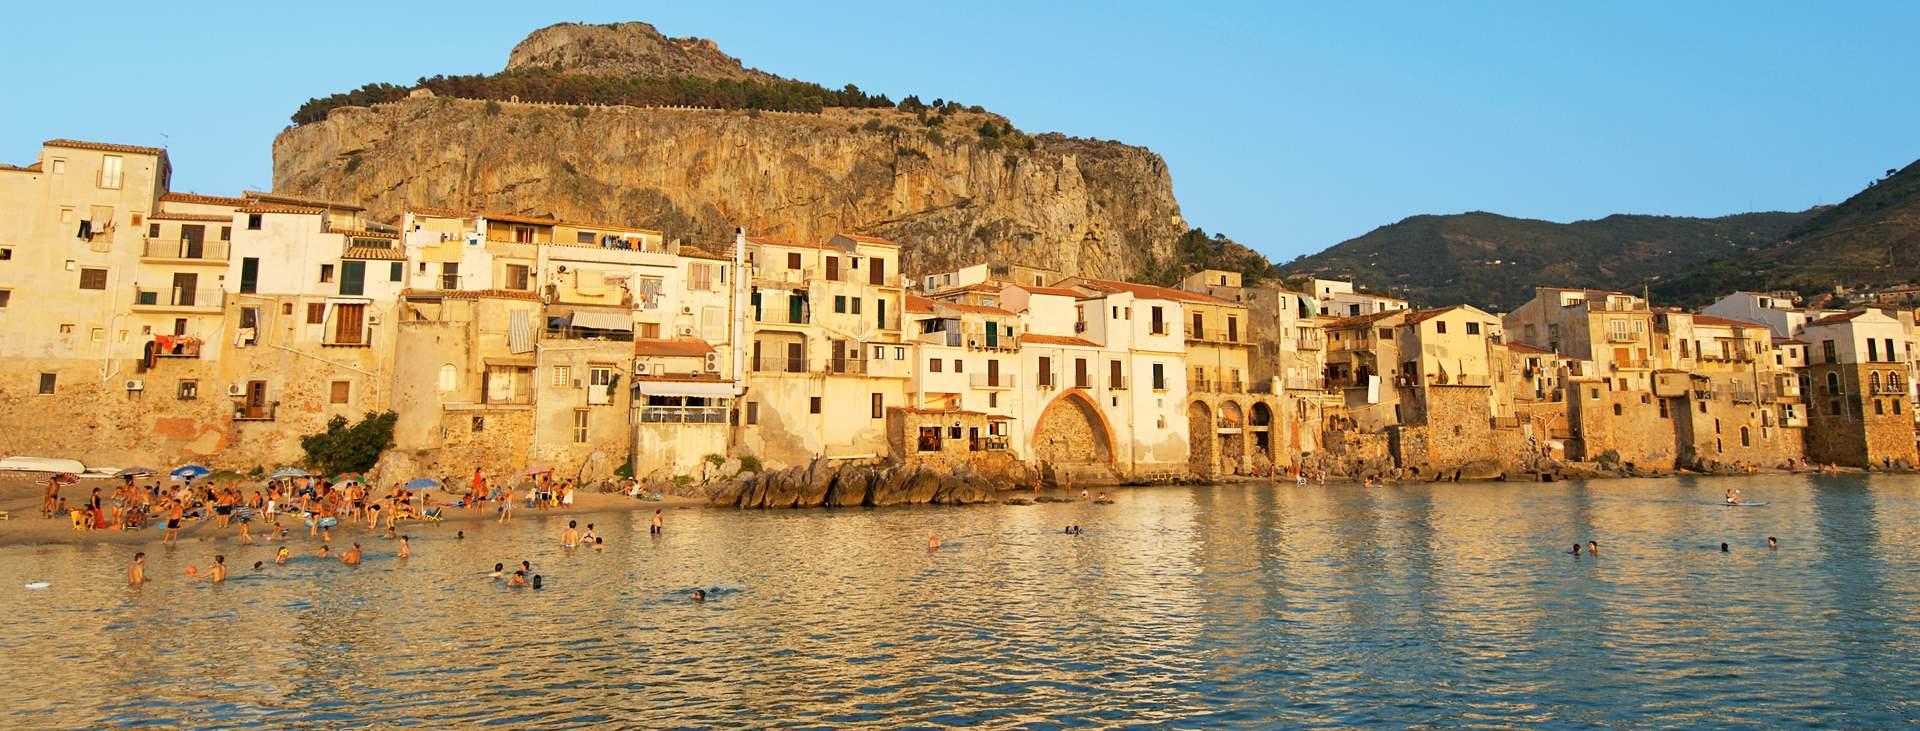 Bestill en reise til Cefalu på Sicilia med Ving